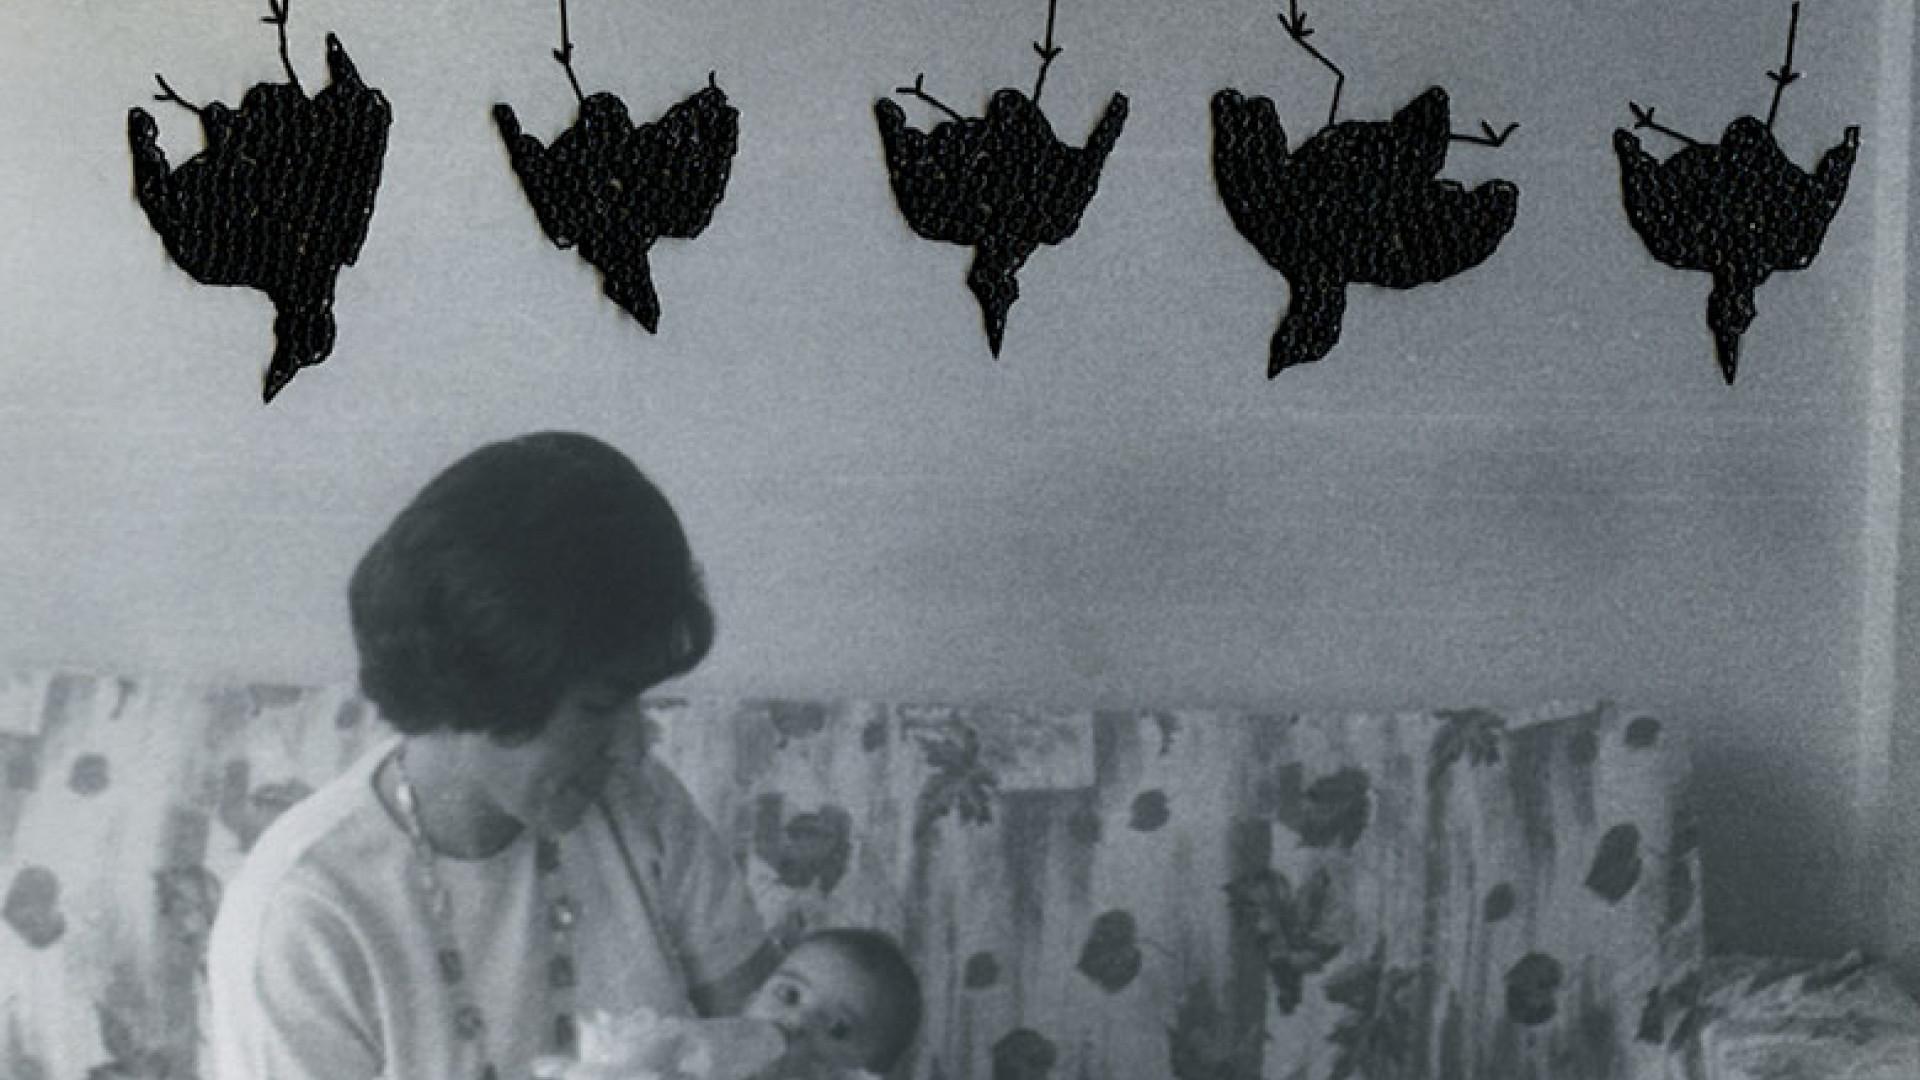 CAROLLE-BENITAH_Oiseaux-pendus_hanged-birds